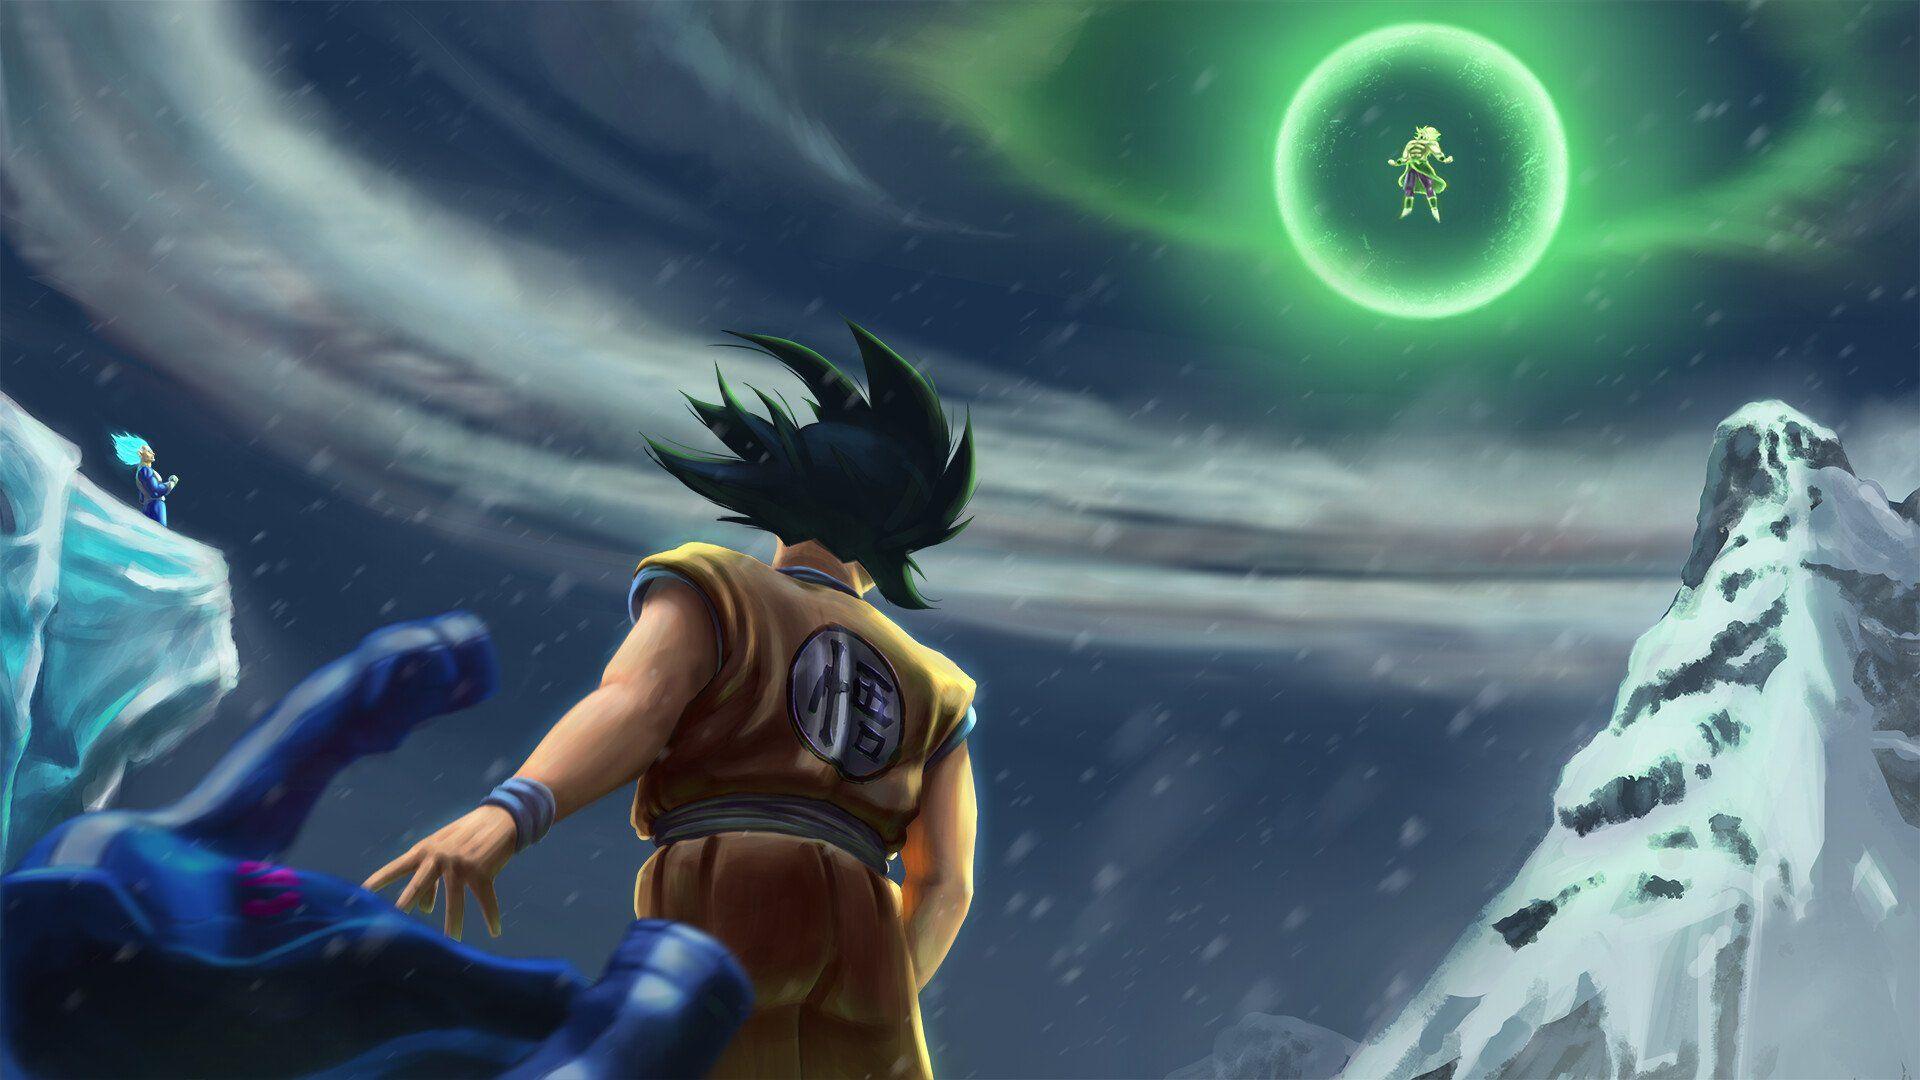 Goku / Vegeta Vs Broly Movie Dragon Ball Super Broly